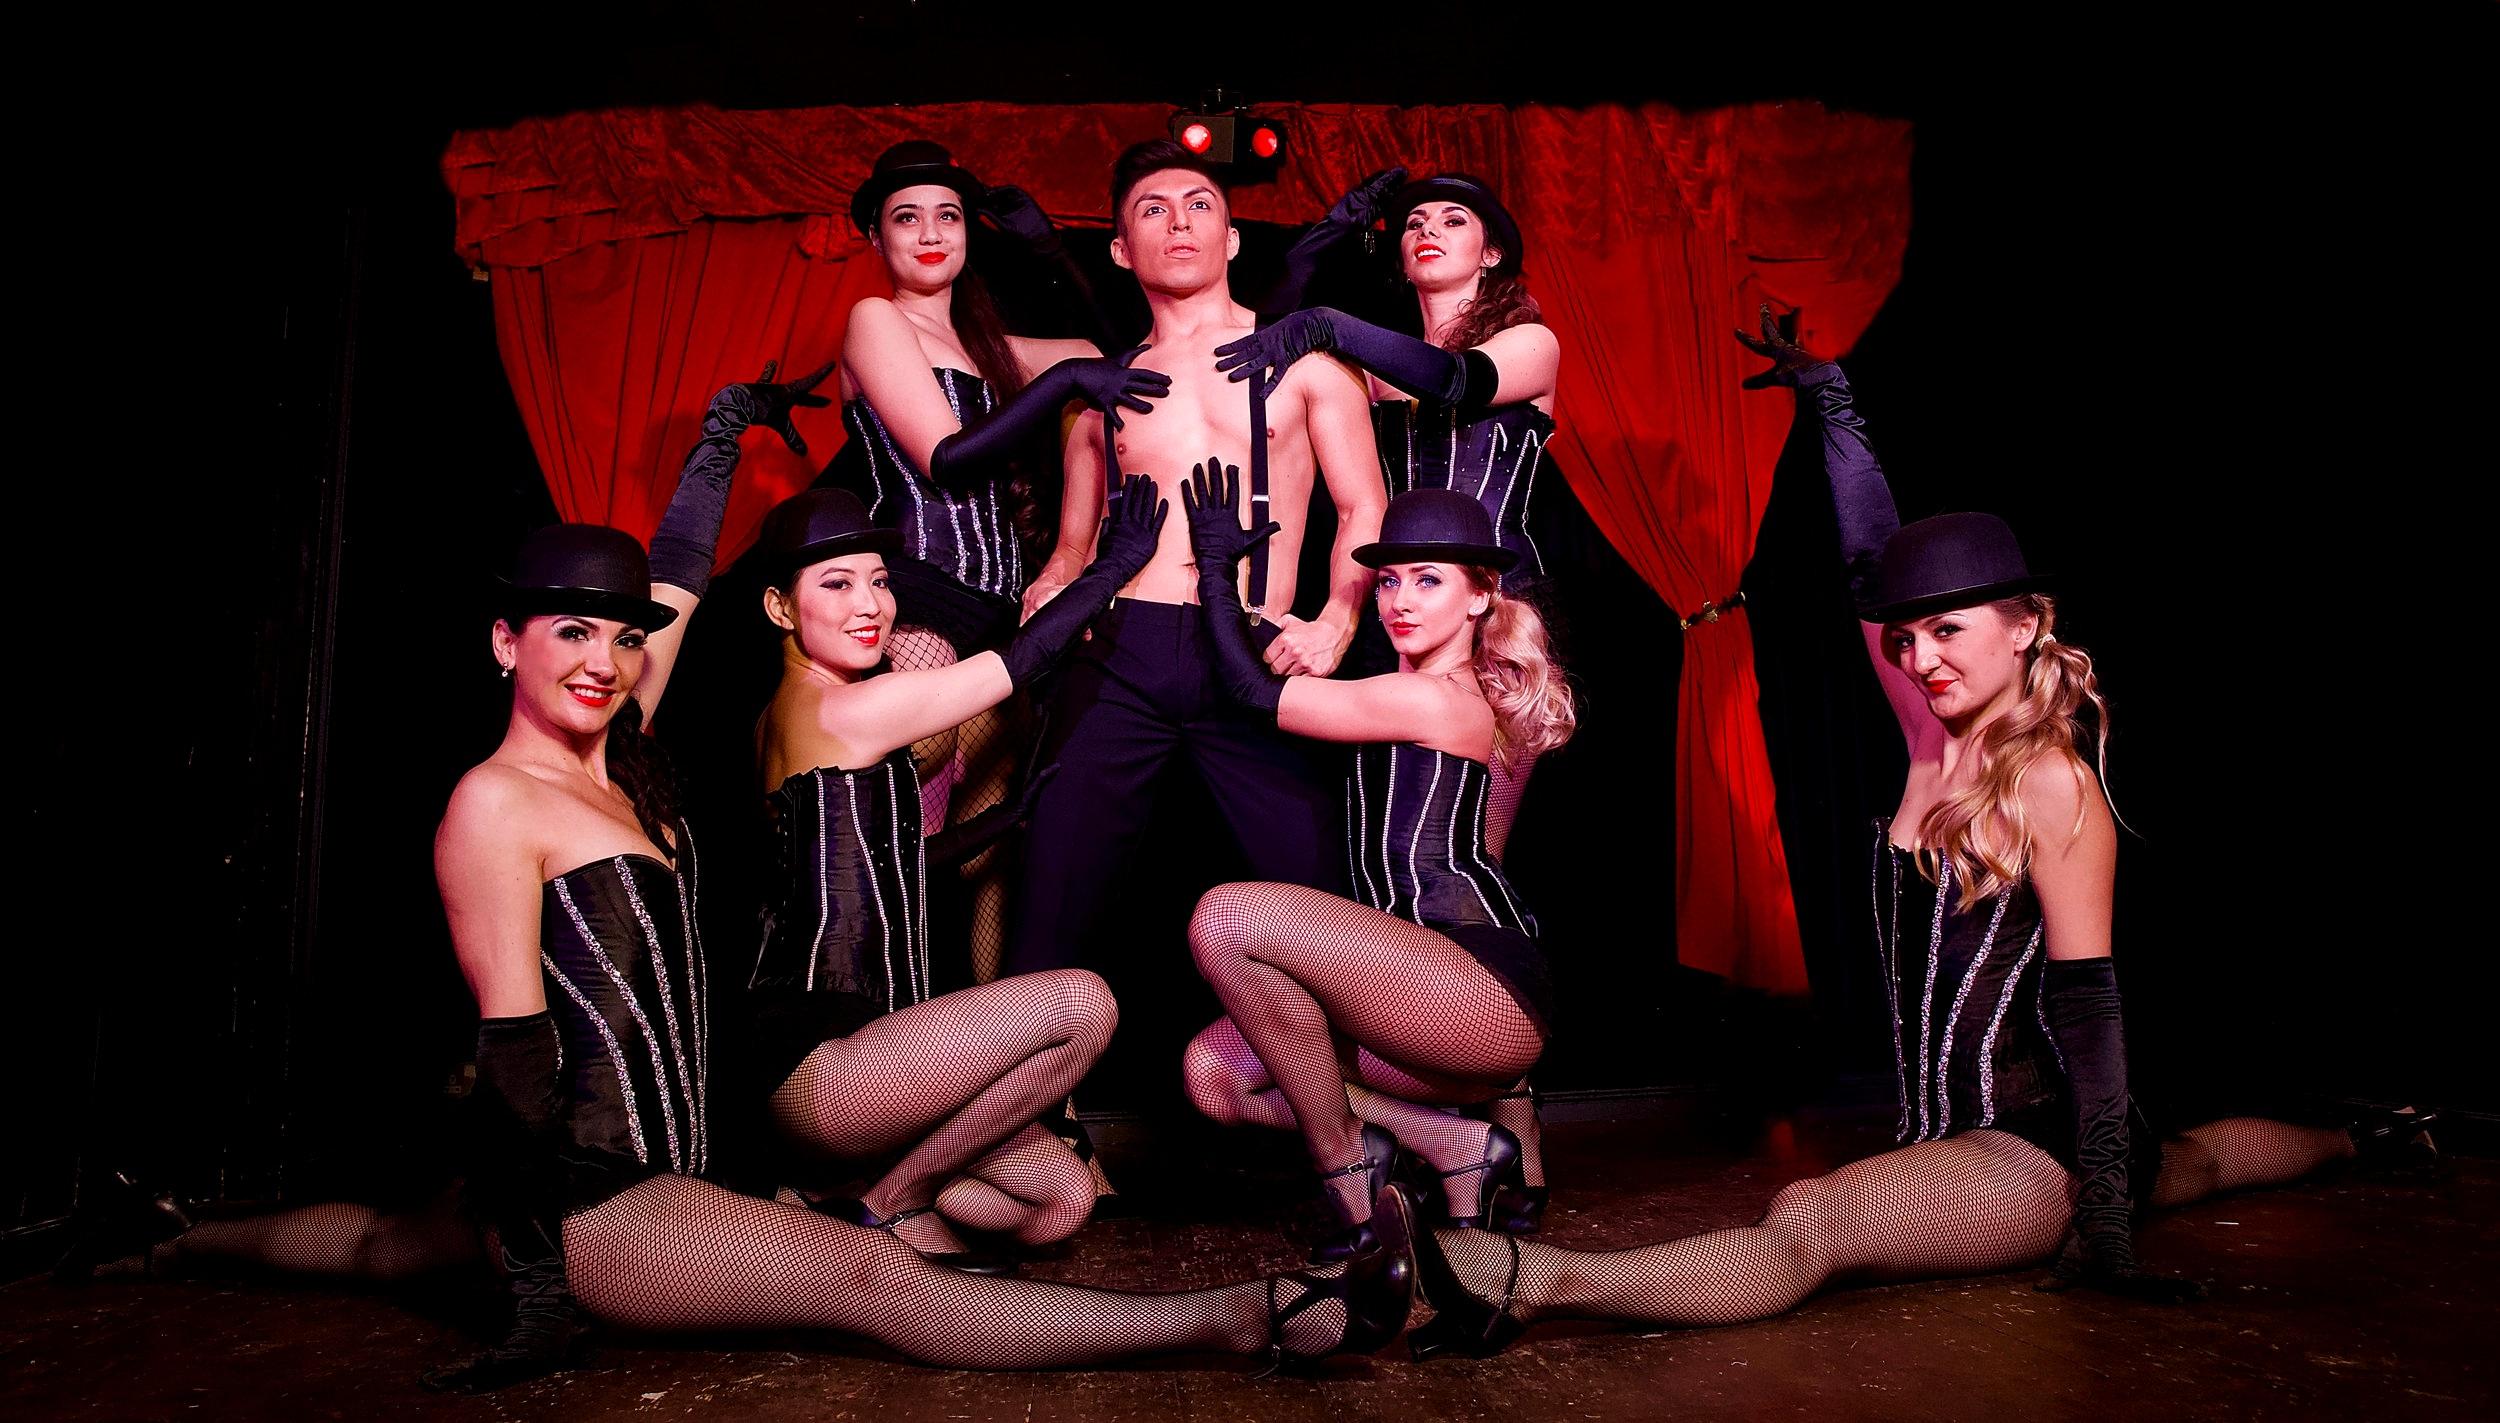 Hire Burlesque Cabaret Dancers — Star Dancers UK   Professional Dance Entertainment for Events